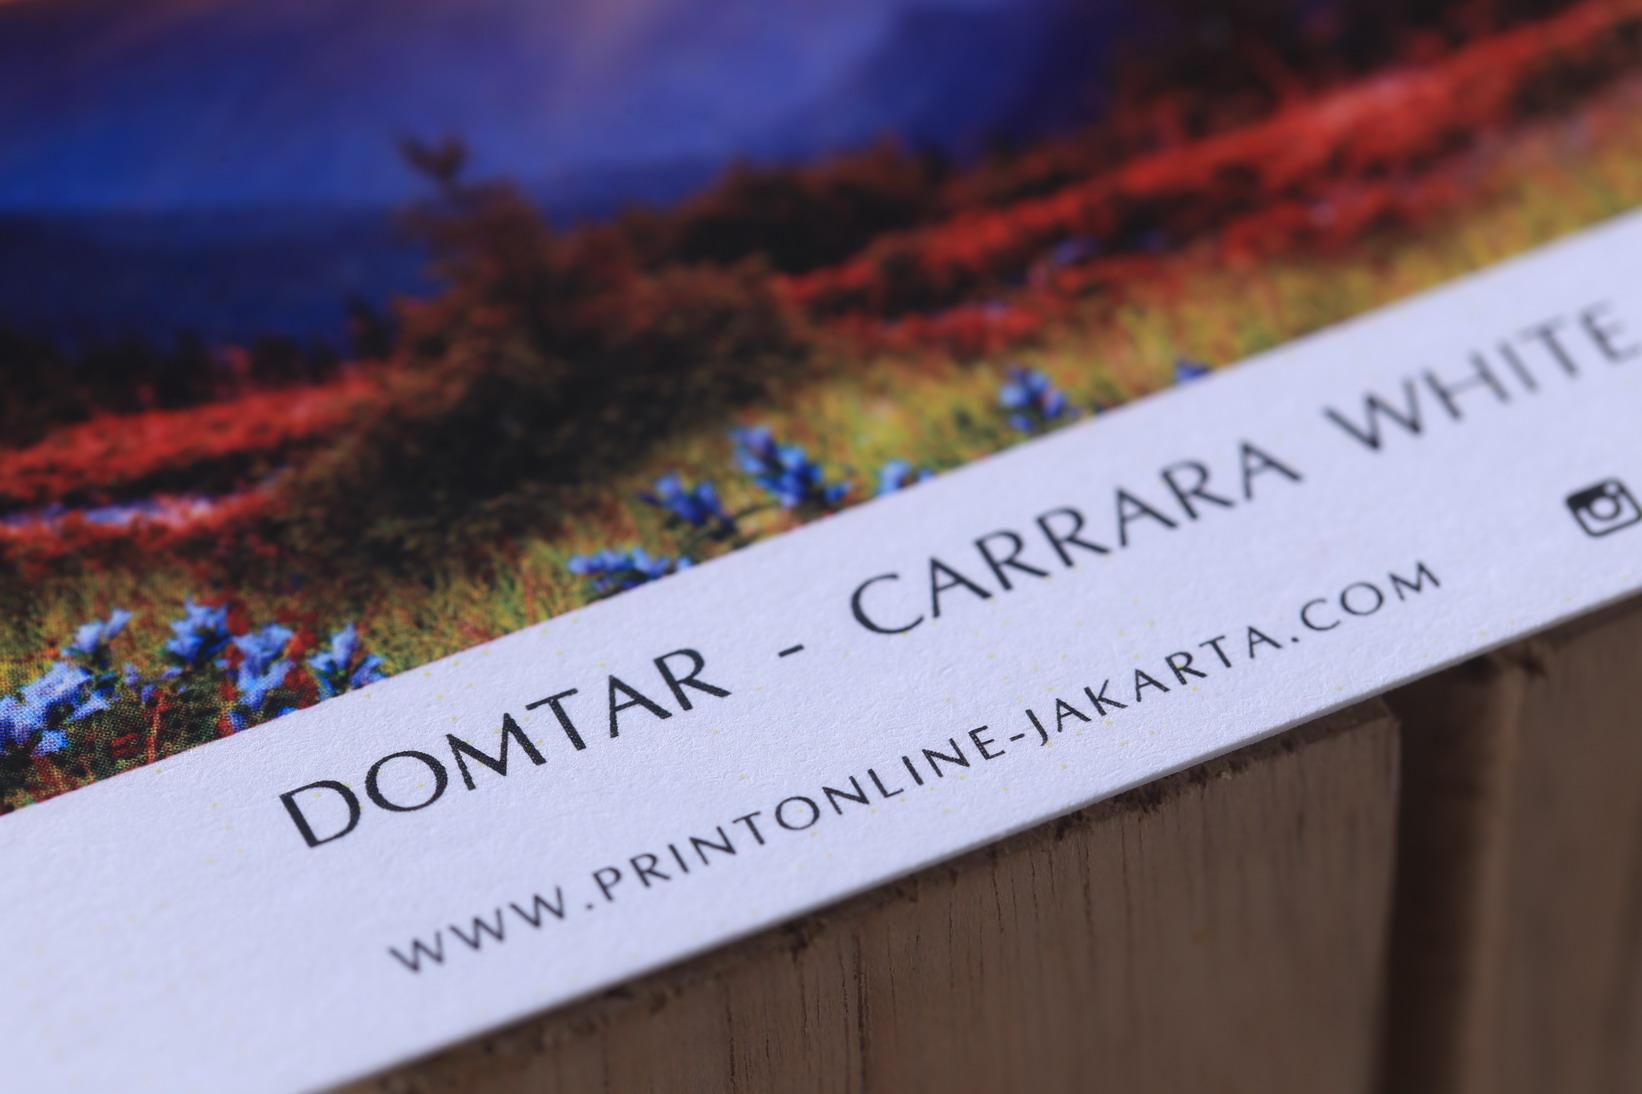 Domtar Carrara White 270 grm